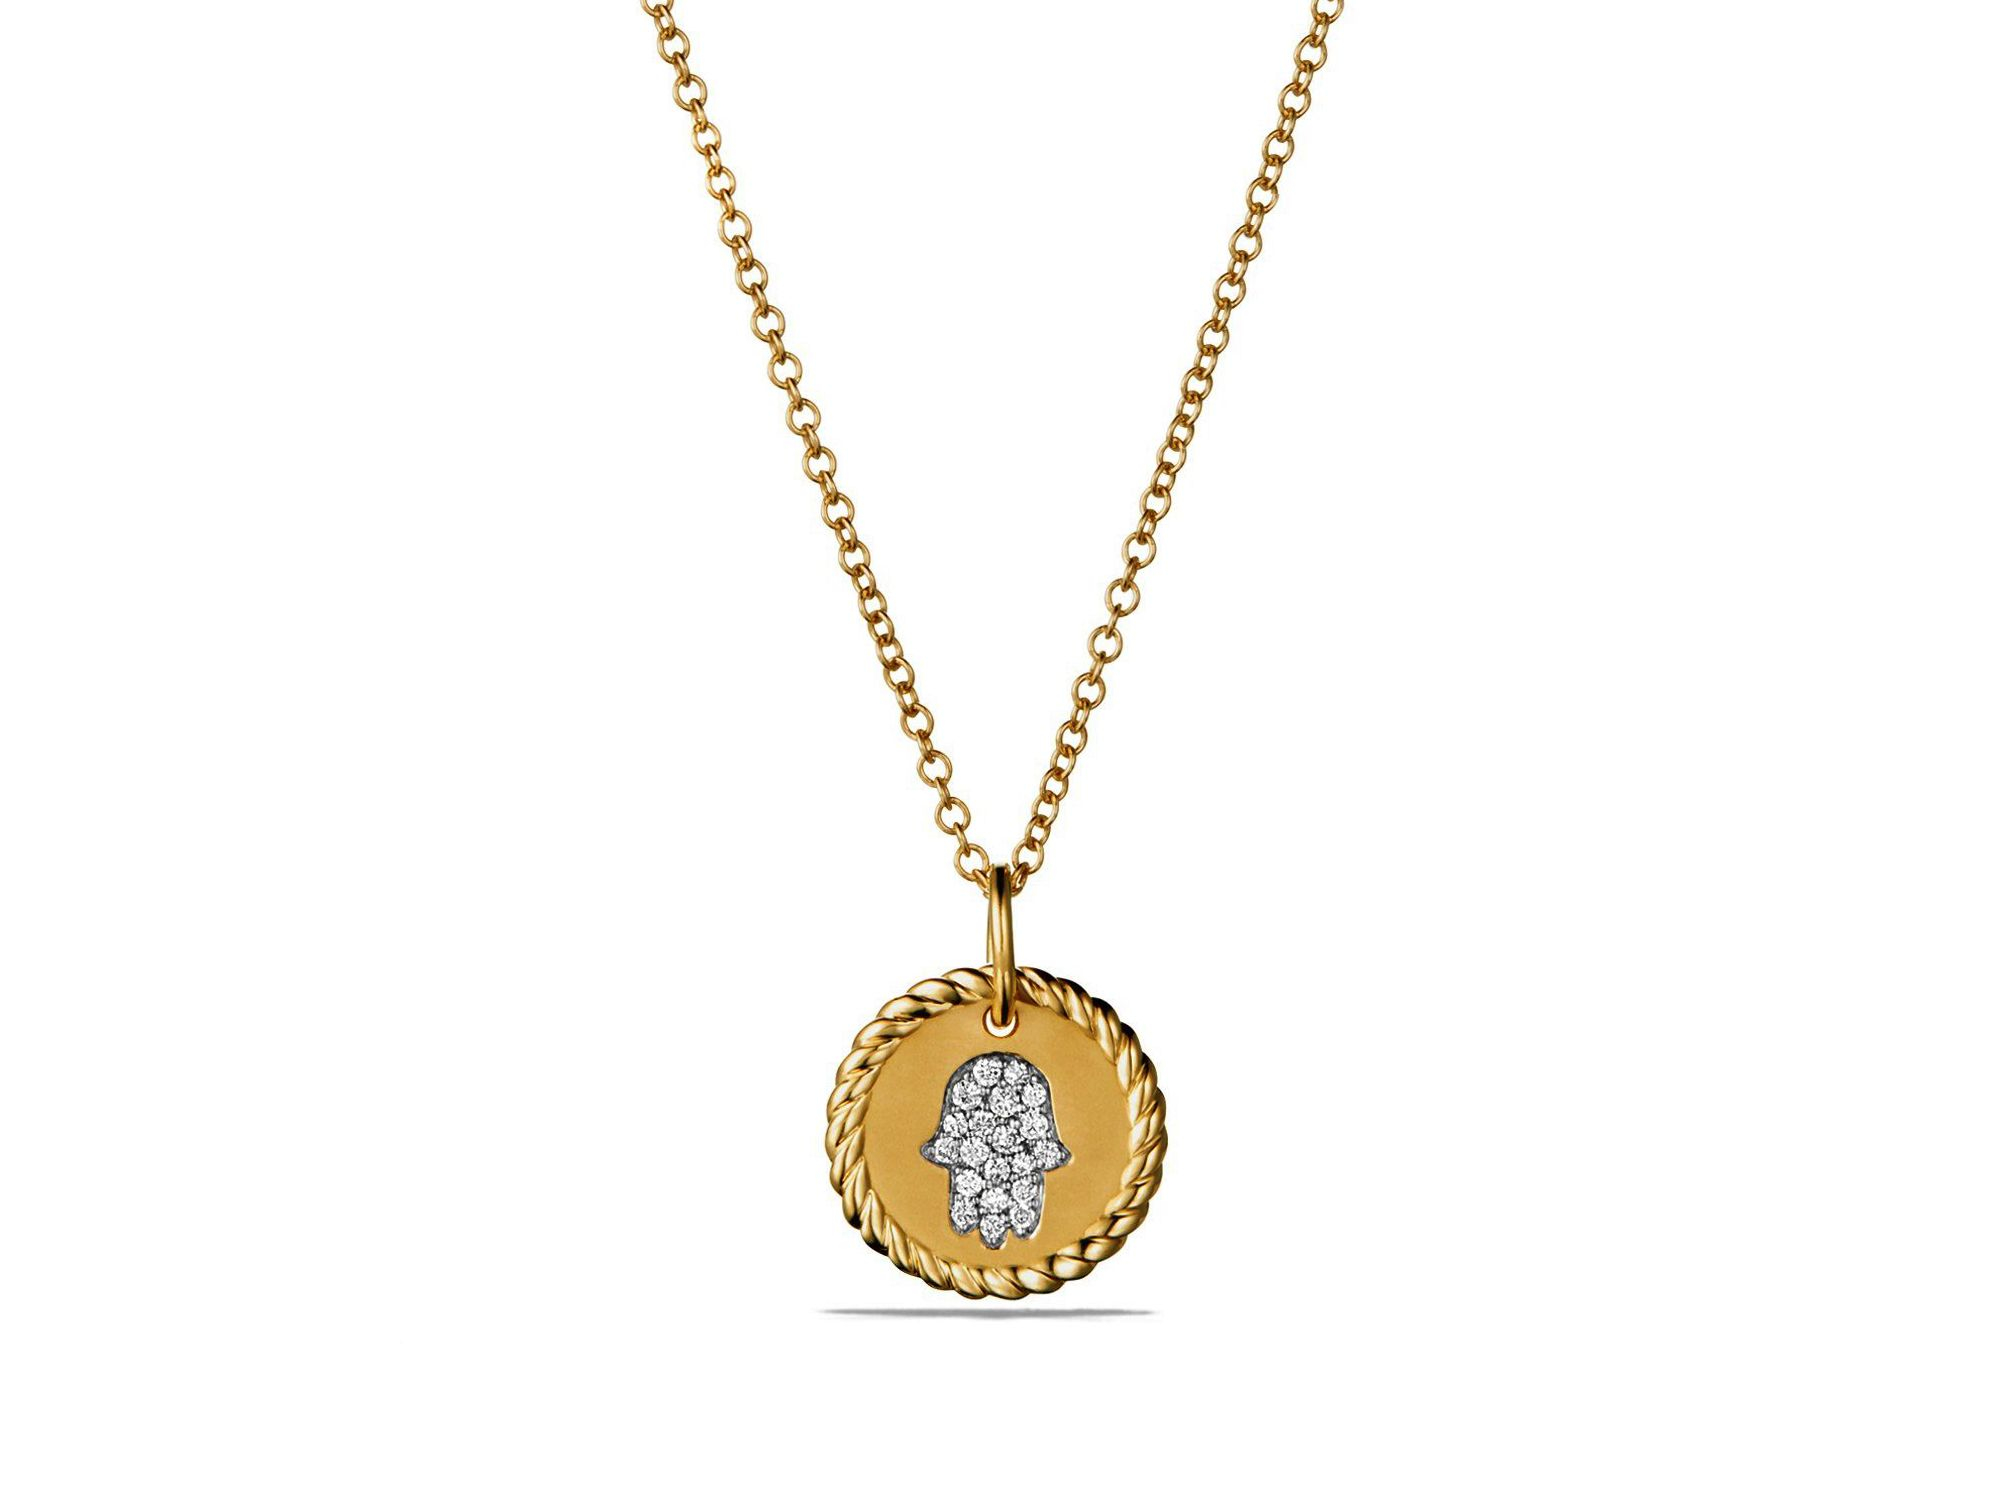 david yurman 18k yellow gold k initial pendant